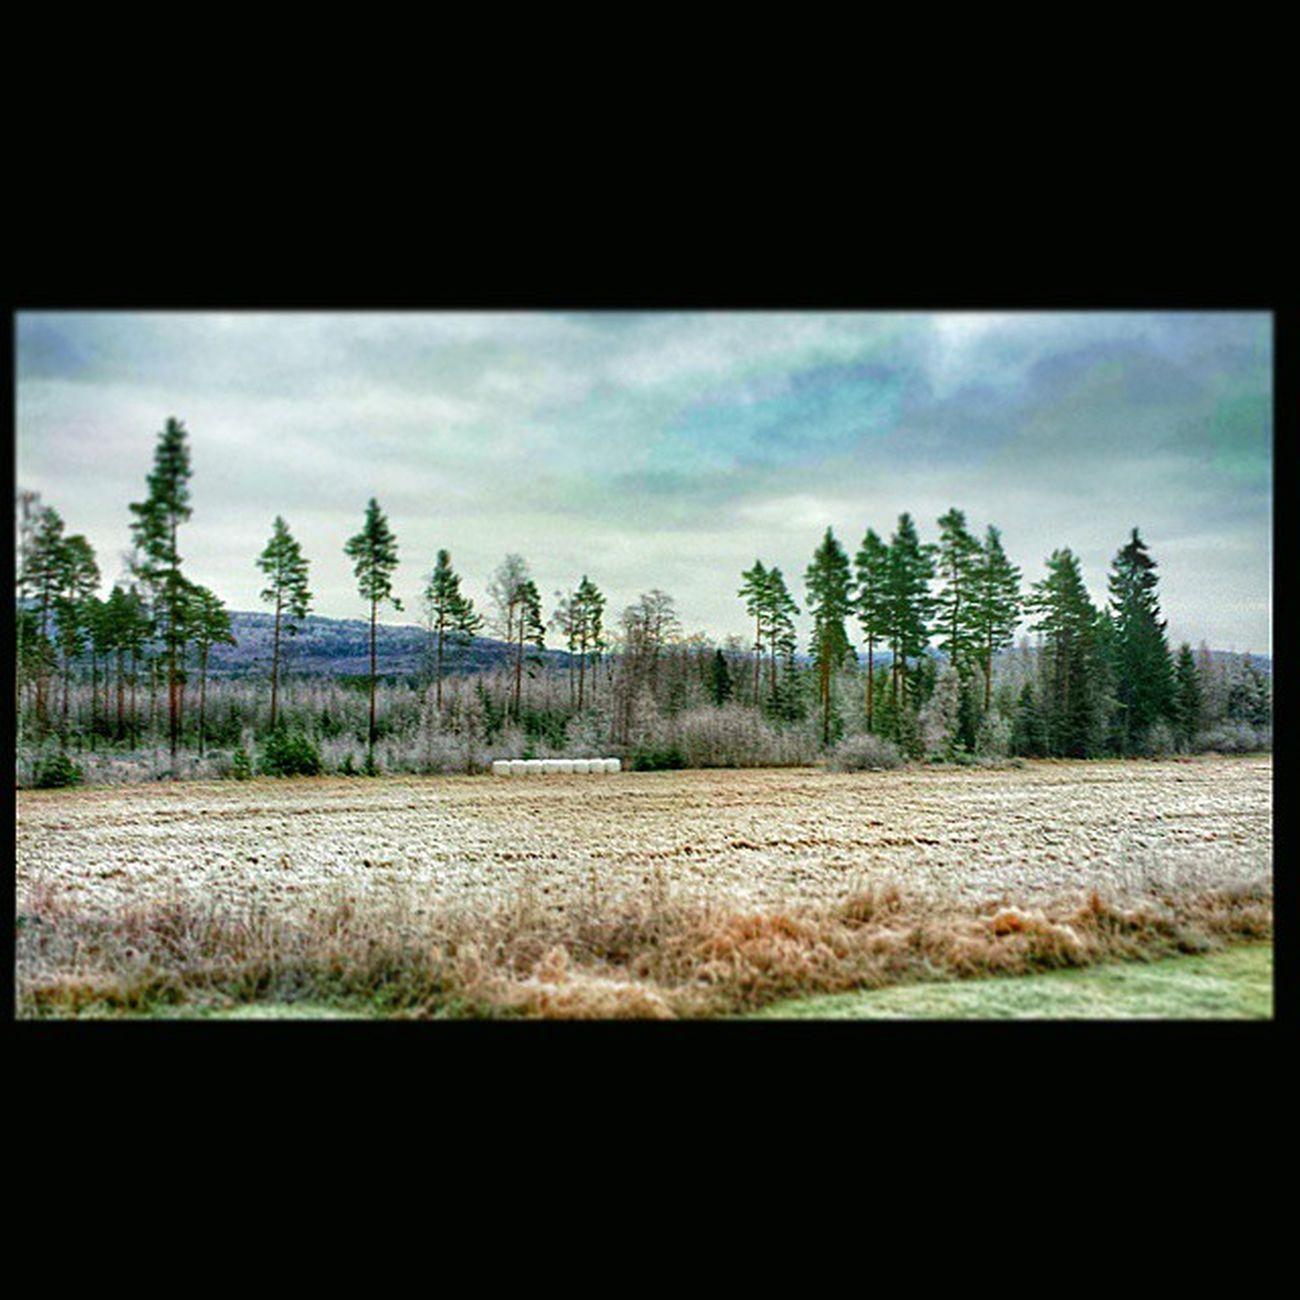 Aker åkrar Nature Natur Dalarna Leksand Hjortnäs